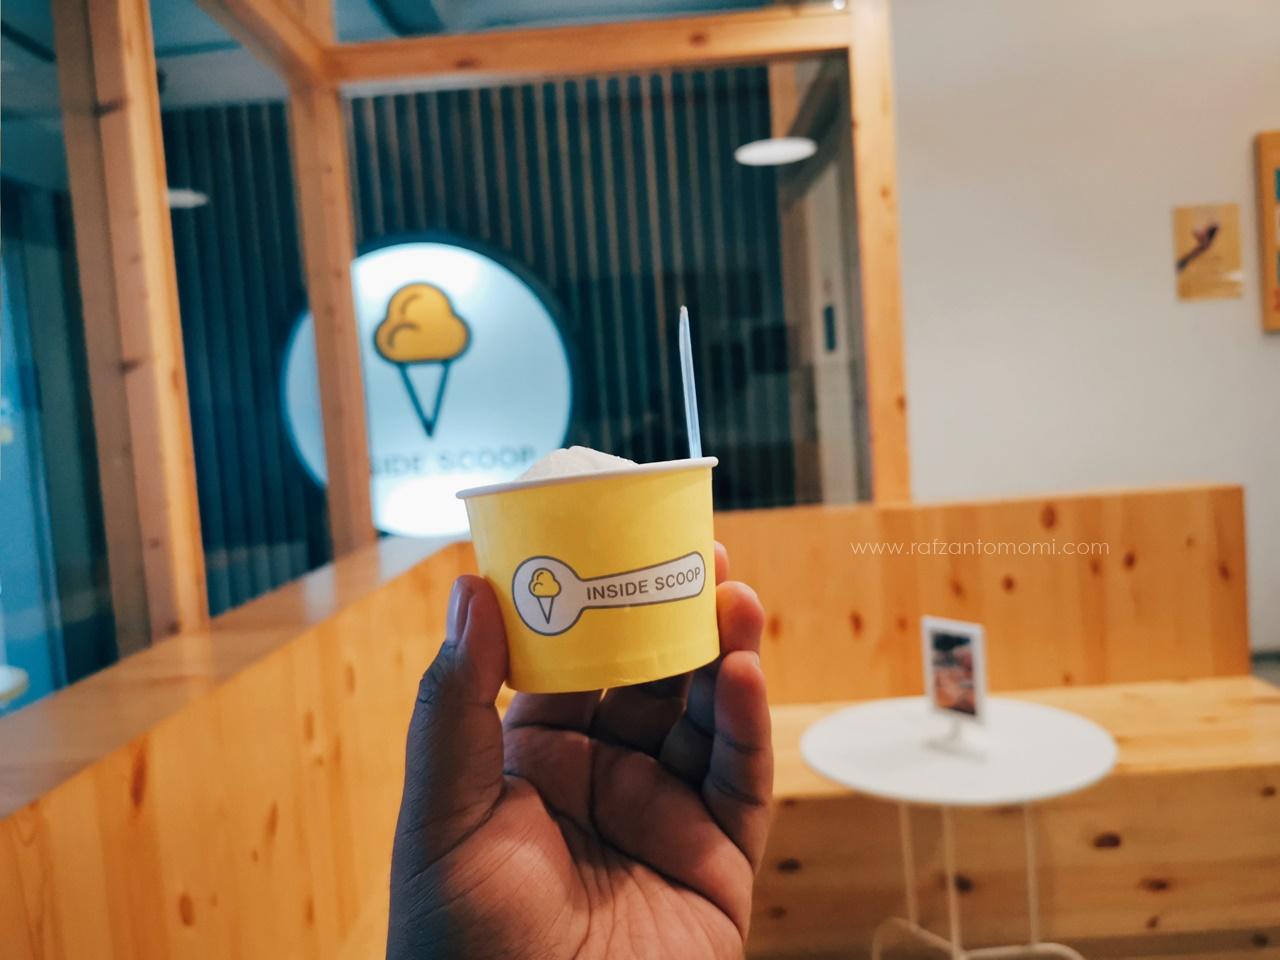 White Rabbit Ice Cream by Inside Scoop